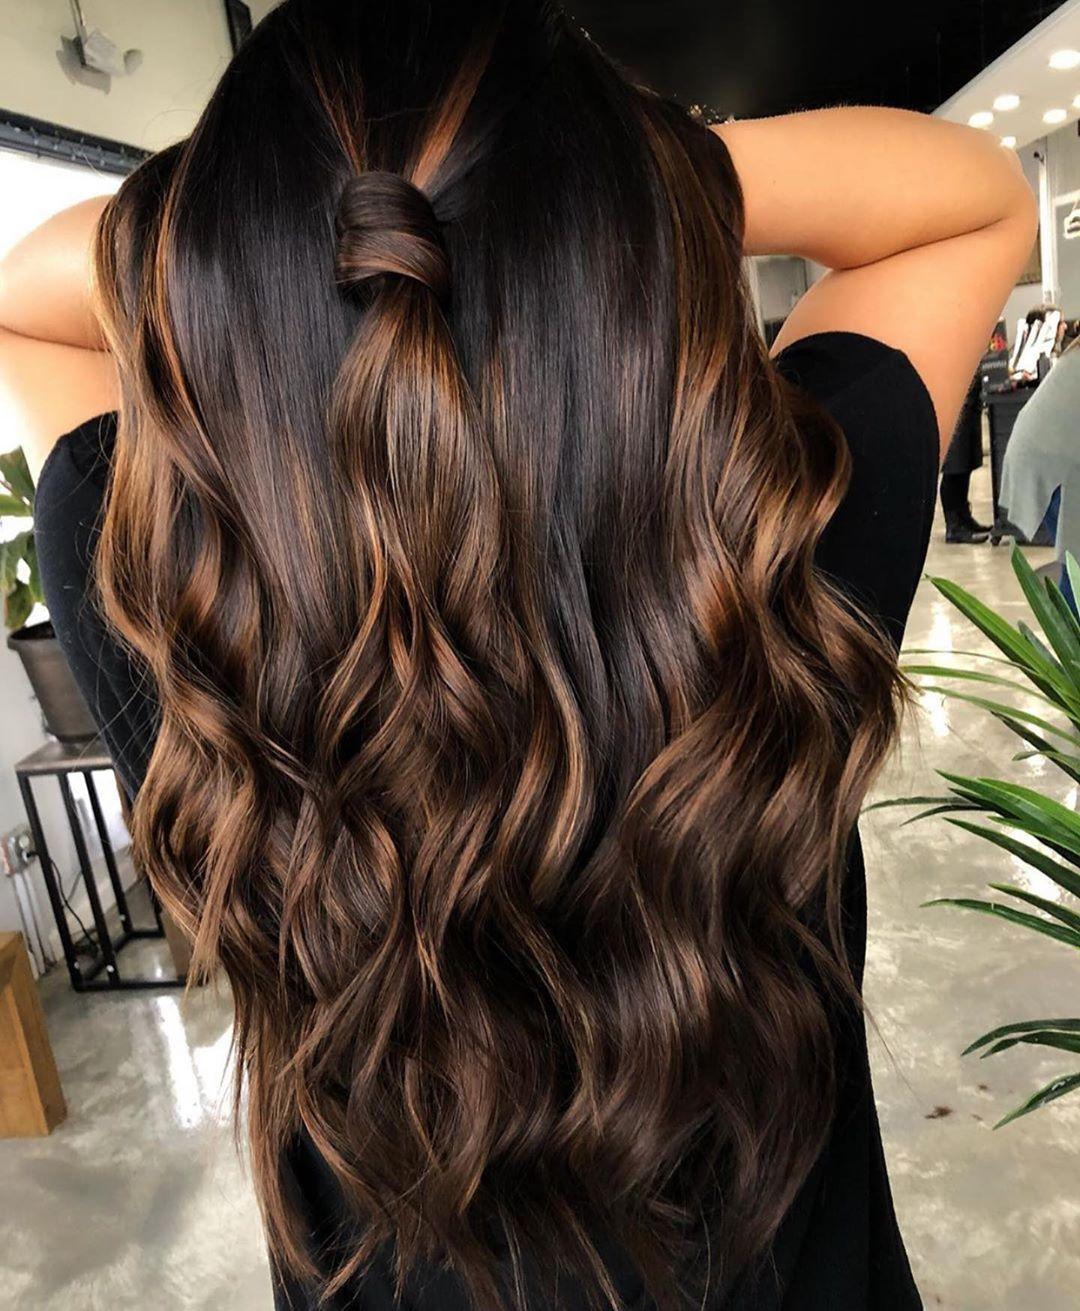 Best Hairstyles 2020 Hair Styles Medium Curly Hair Styles Short Curly Haircuts